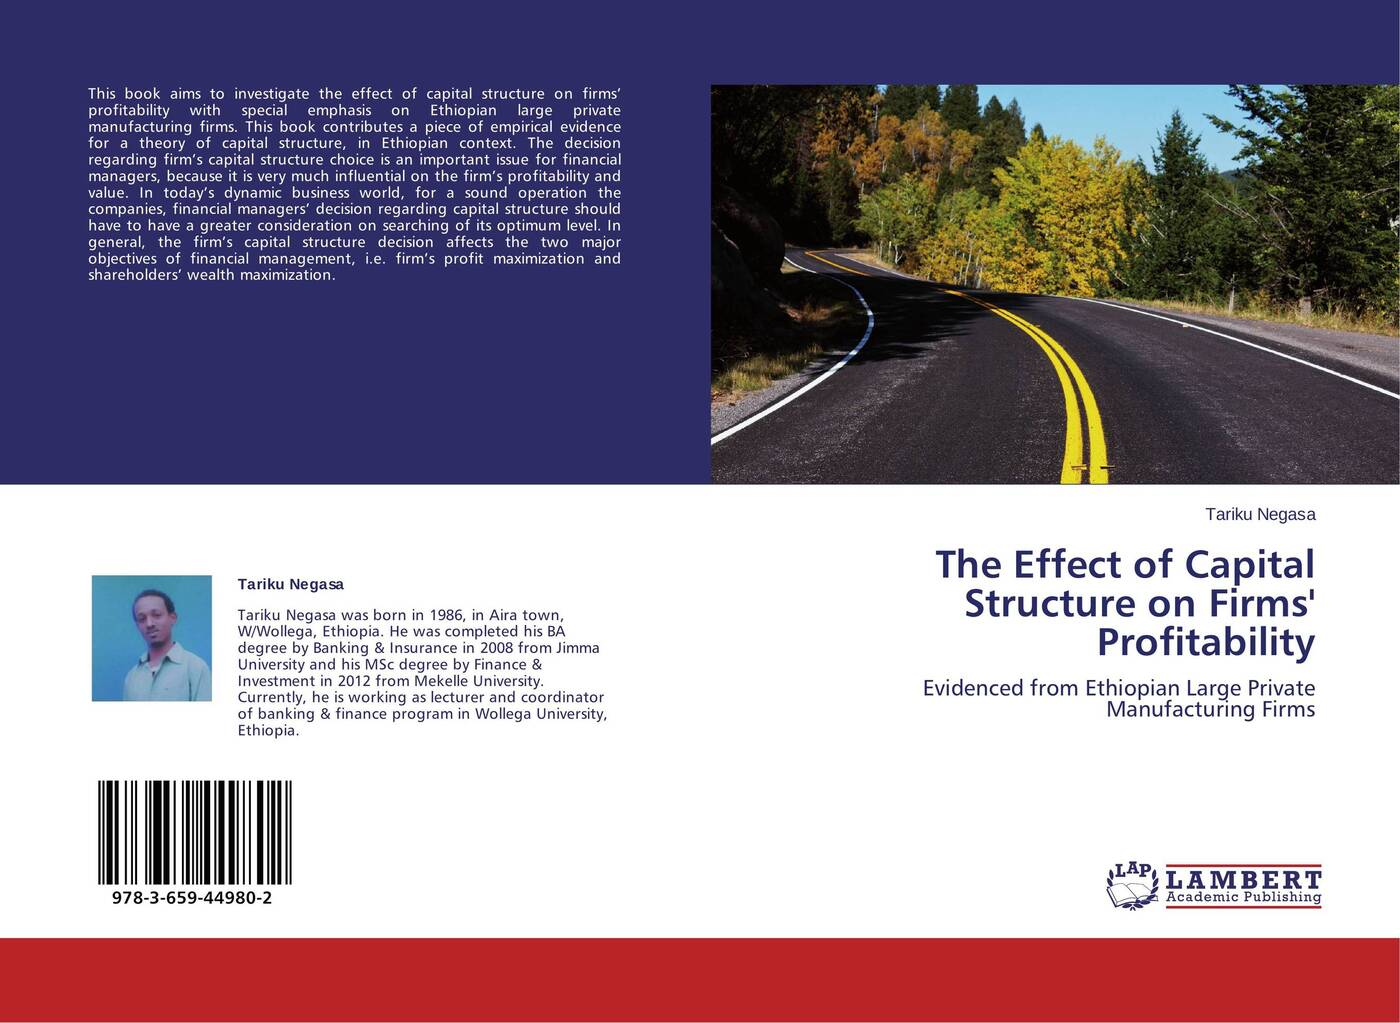 Tariku Negasa The Effect of Capital Structure on Firms' Profitability цена в Москве и Питере